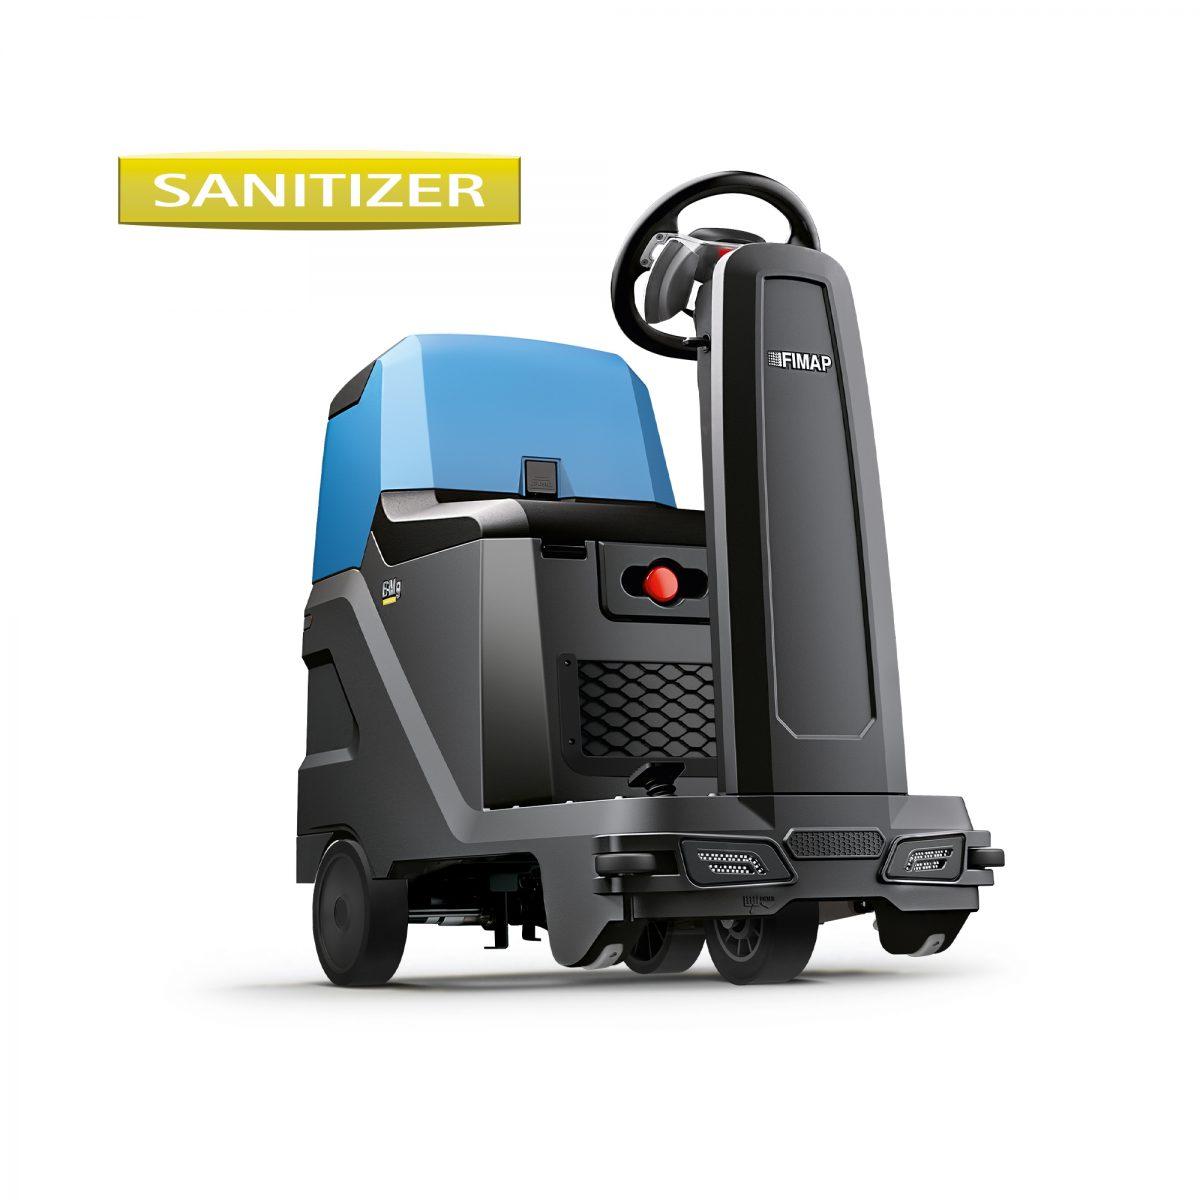 Fimap BMg Sanitizer